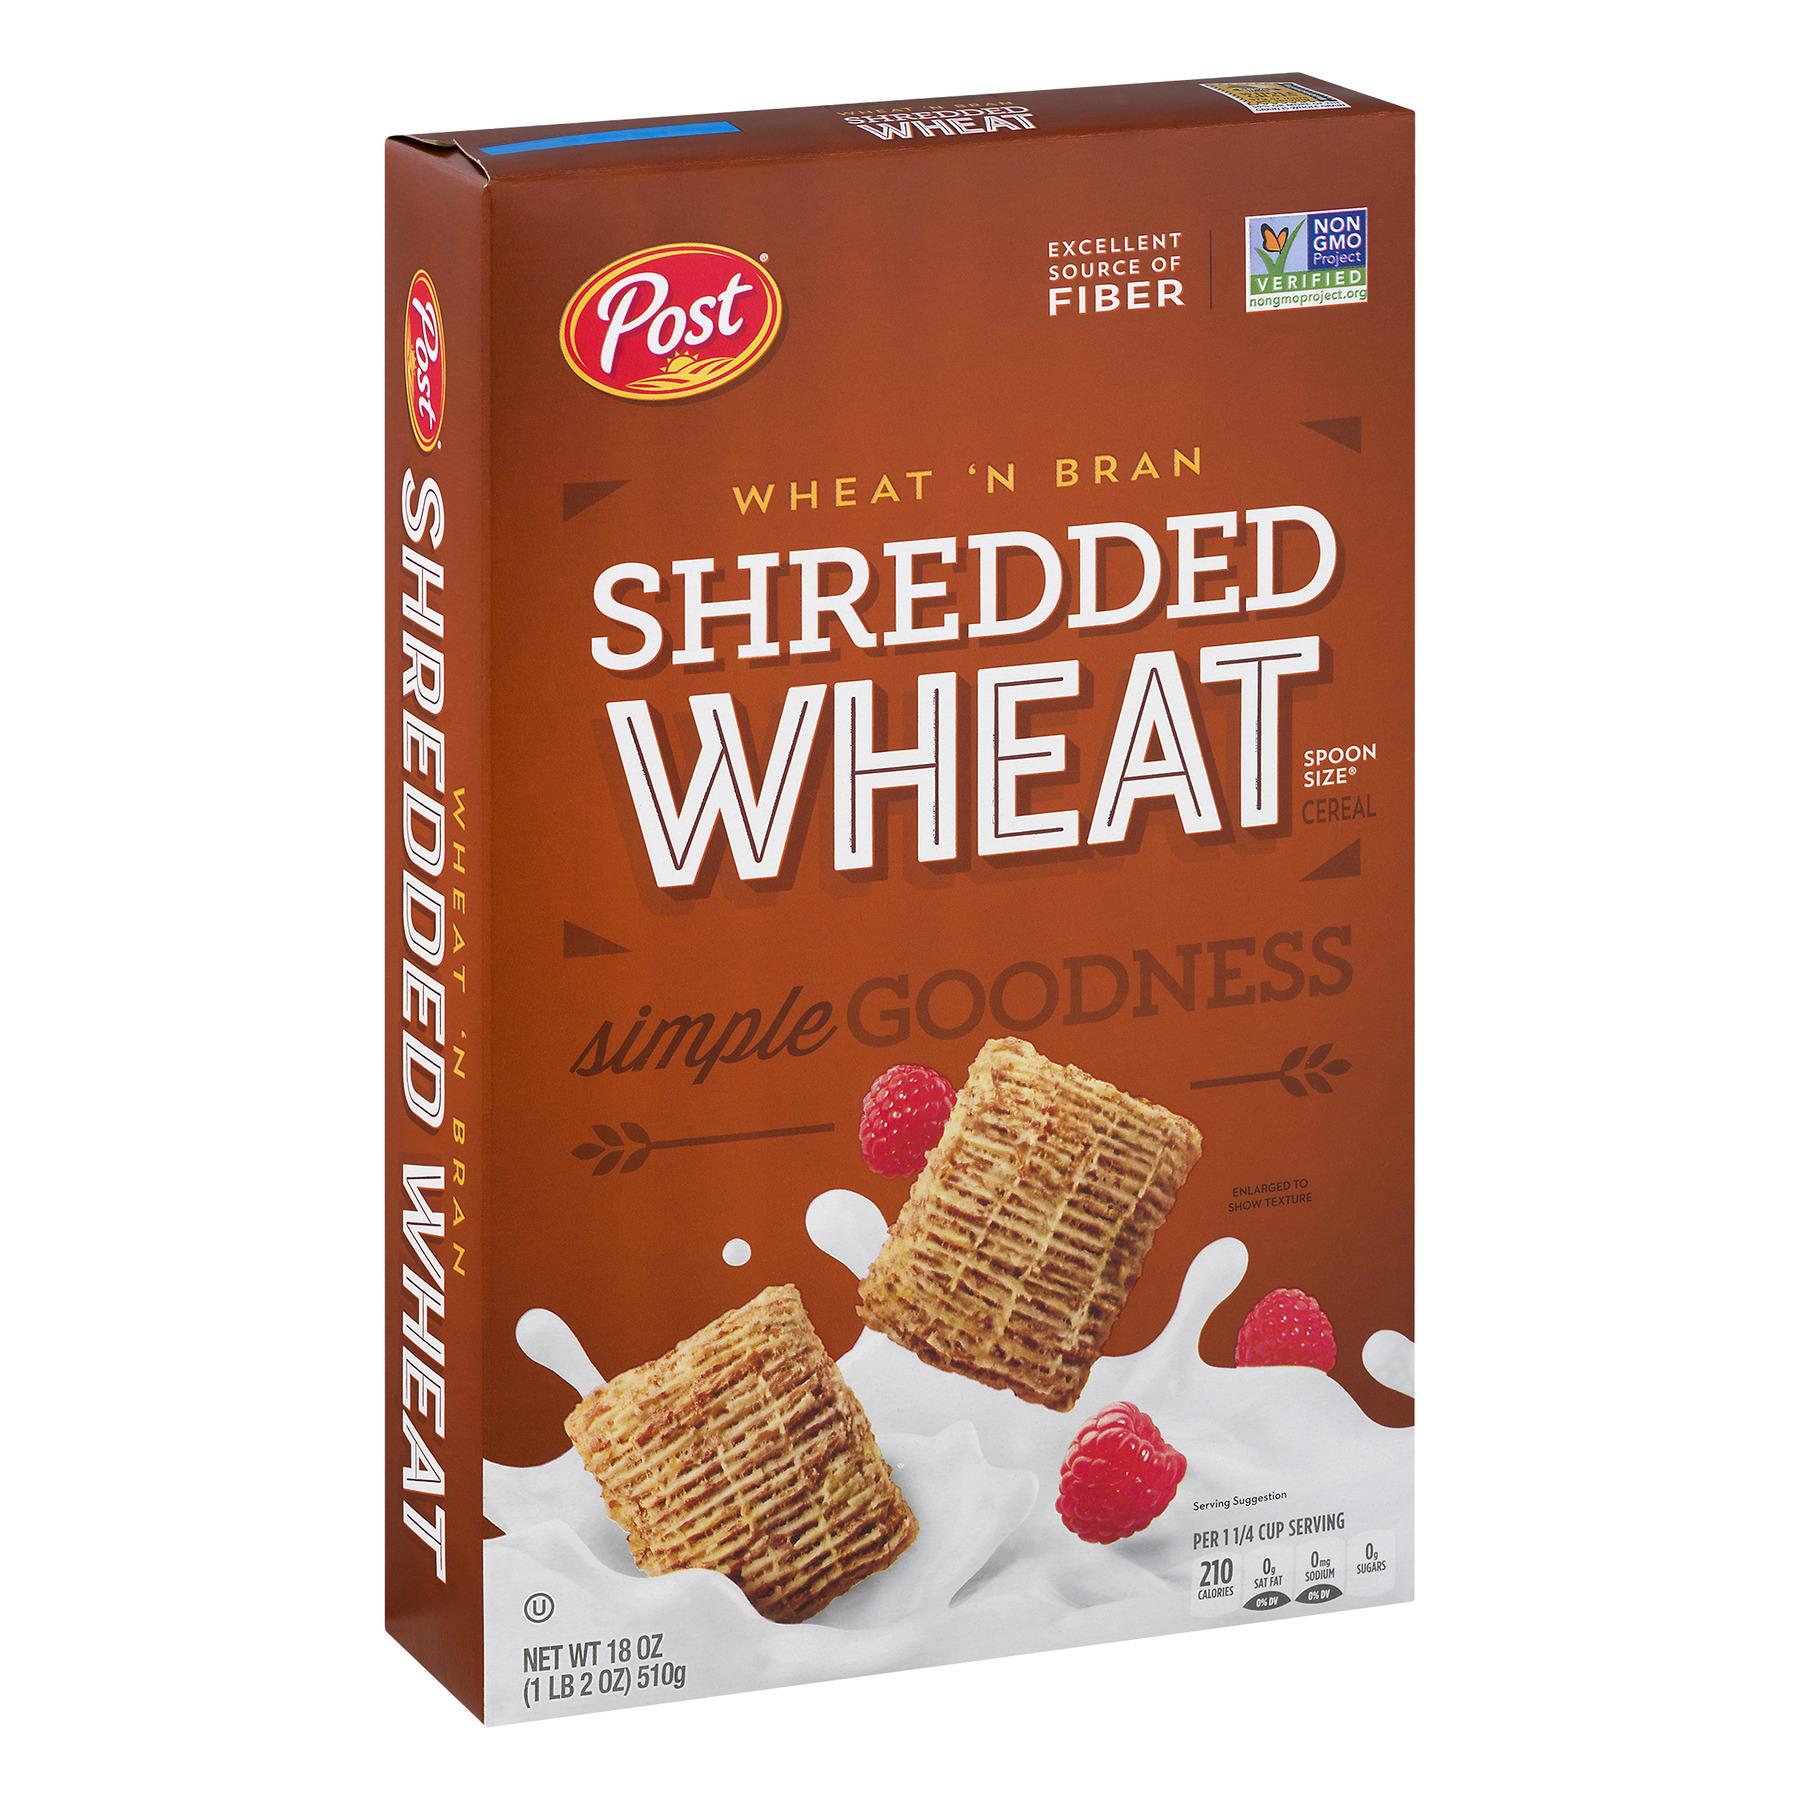 Post Shredded Wheat Breakfast Cereal, Wheat & Bran, 18 Oz